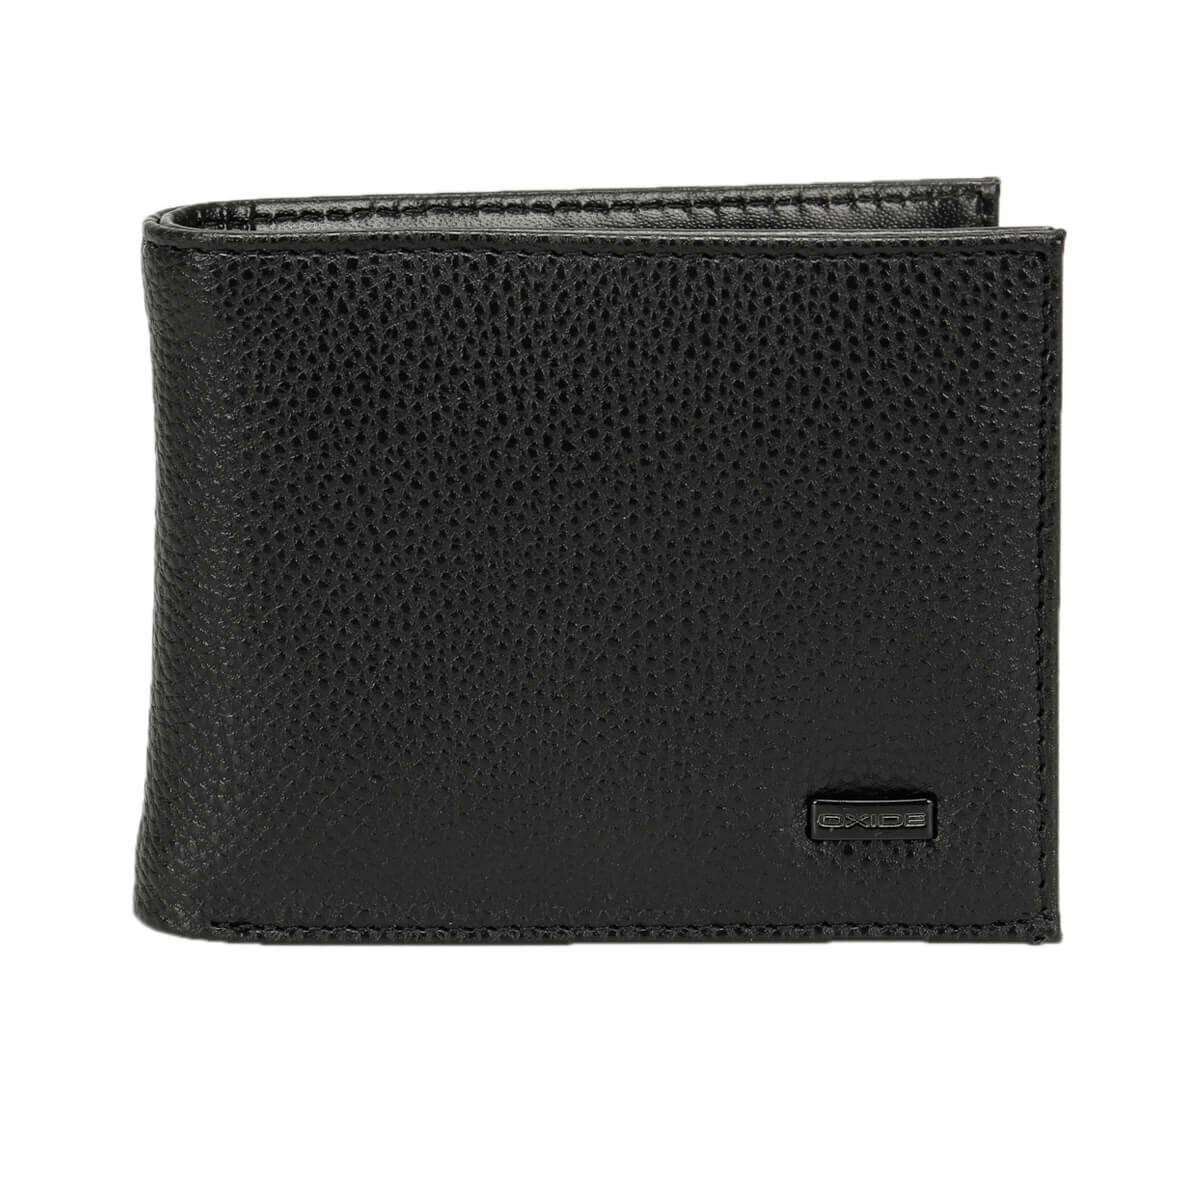 FLO MKNY2208 Black Male Wallet Oxide